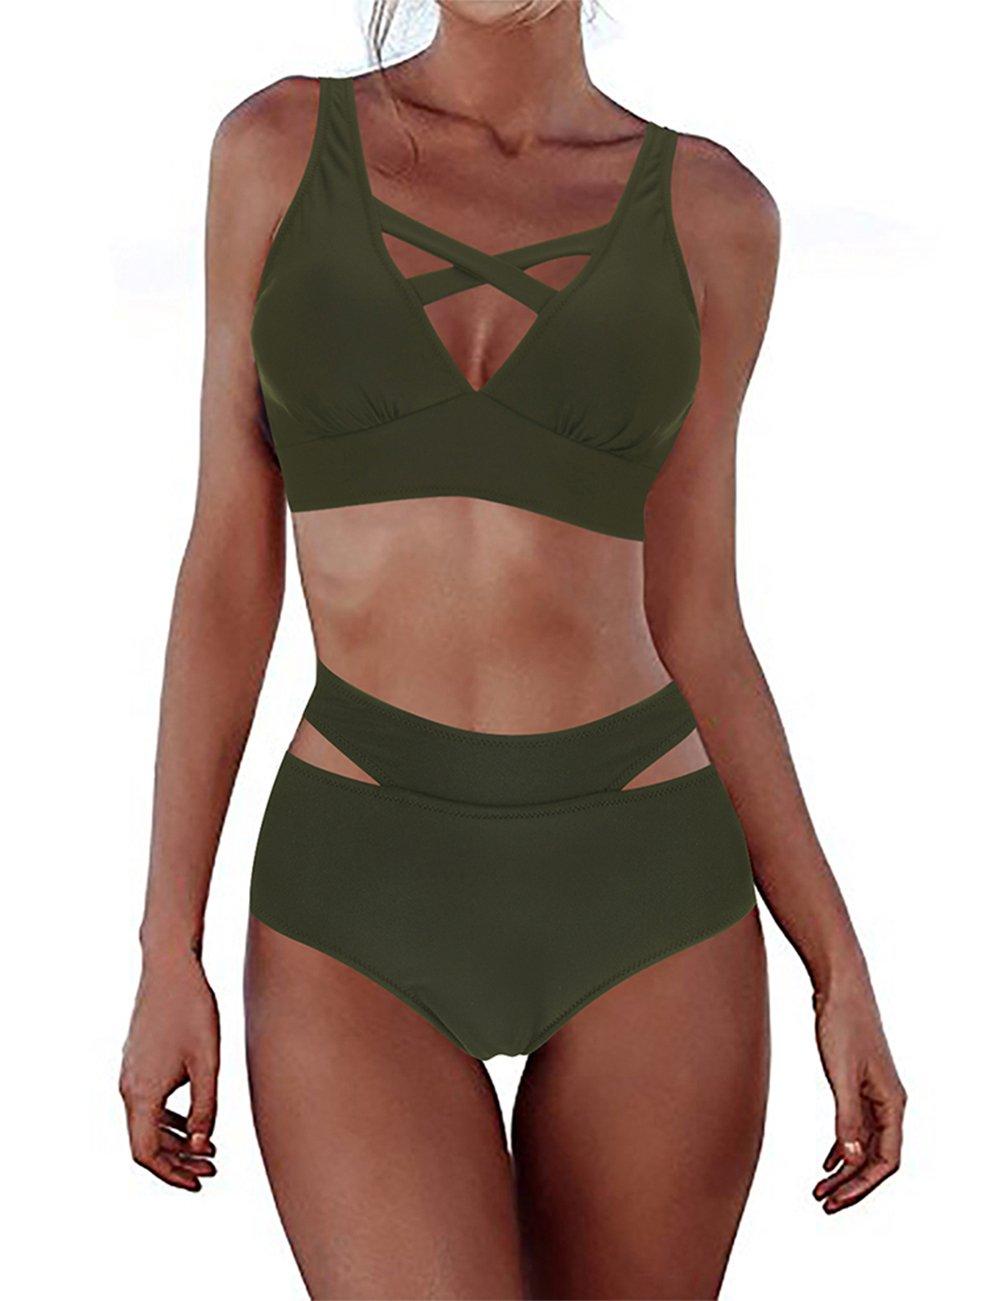 Vilover Sexy Two Piece Bikini Set Zip Front Swimsuit Sports Style Thong Bottom Swimwear (Army Green, M(US 6-8))